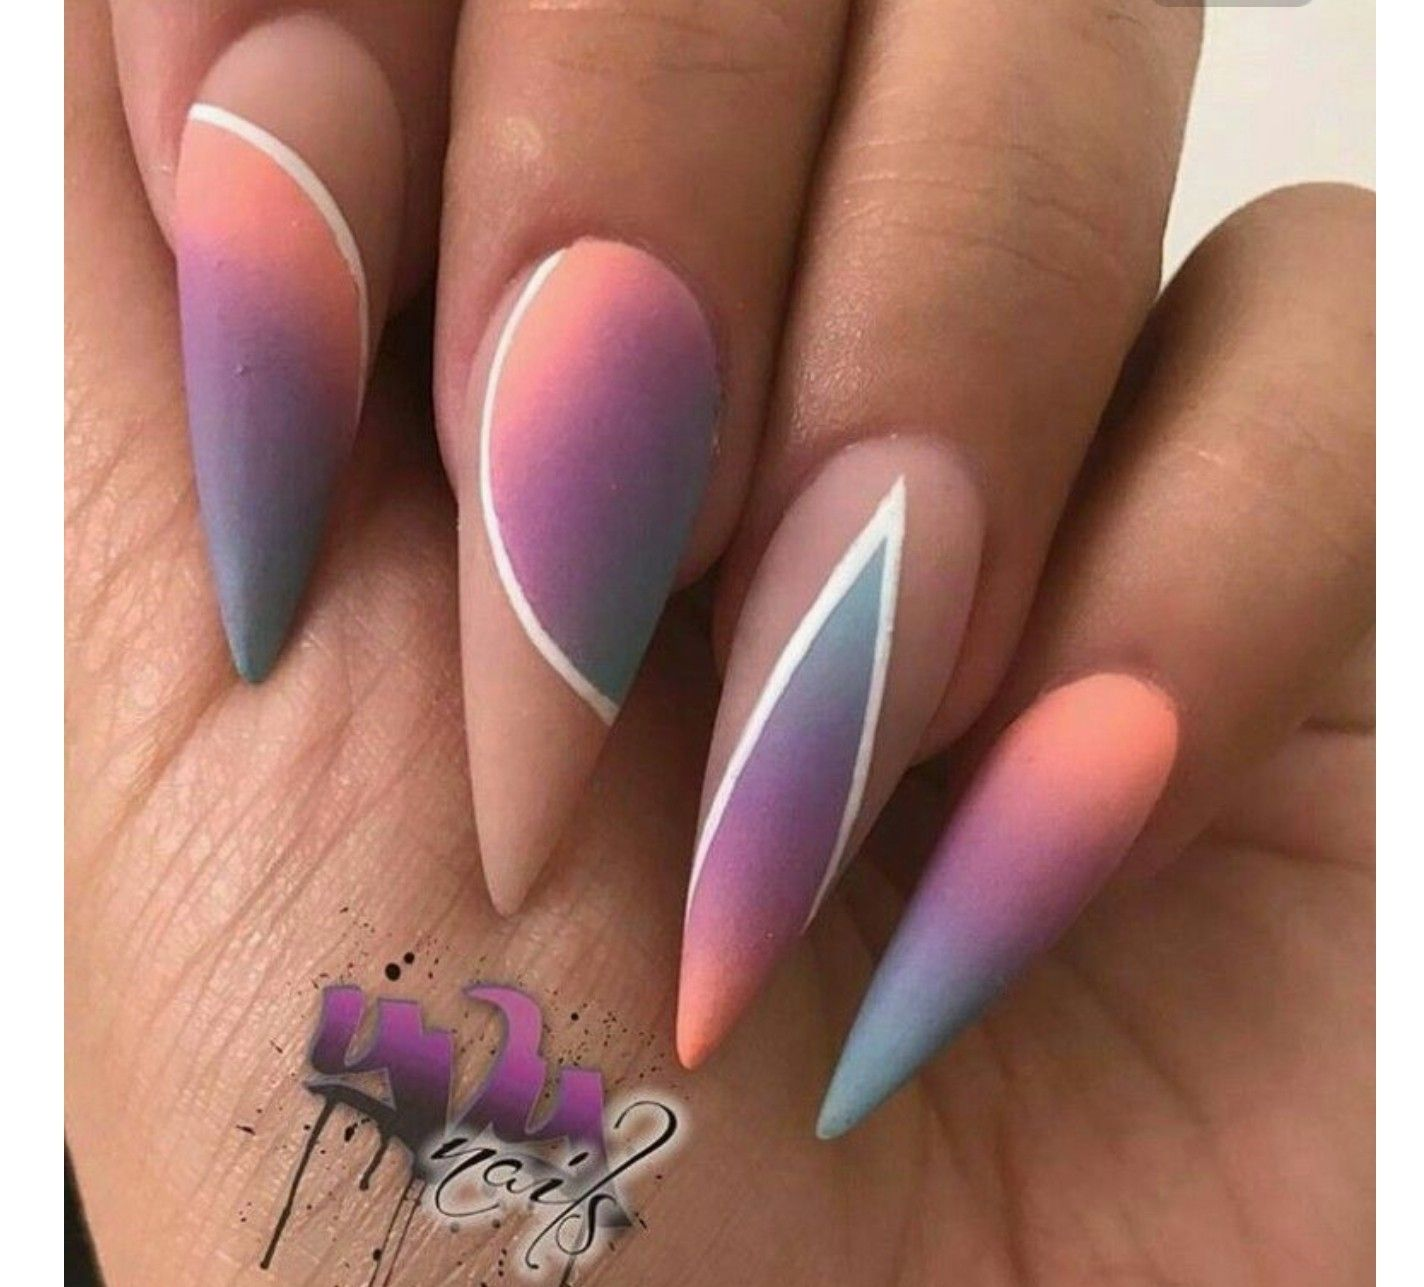 Stiletto nails | nail art design ideas. Teen Girl BedroomsCotton Candy ... - Stiletto Nails Nail Art Design Ideas Nails Pinterest Nail